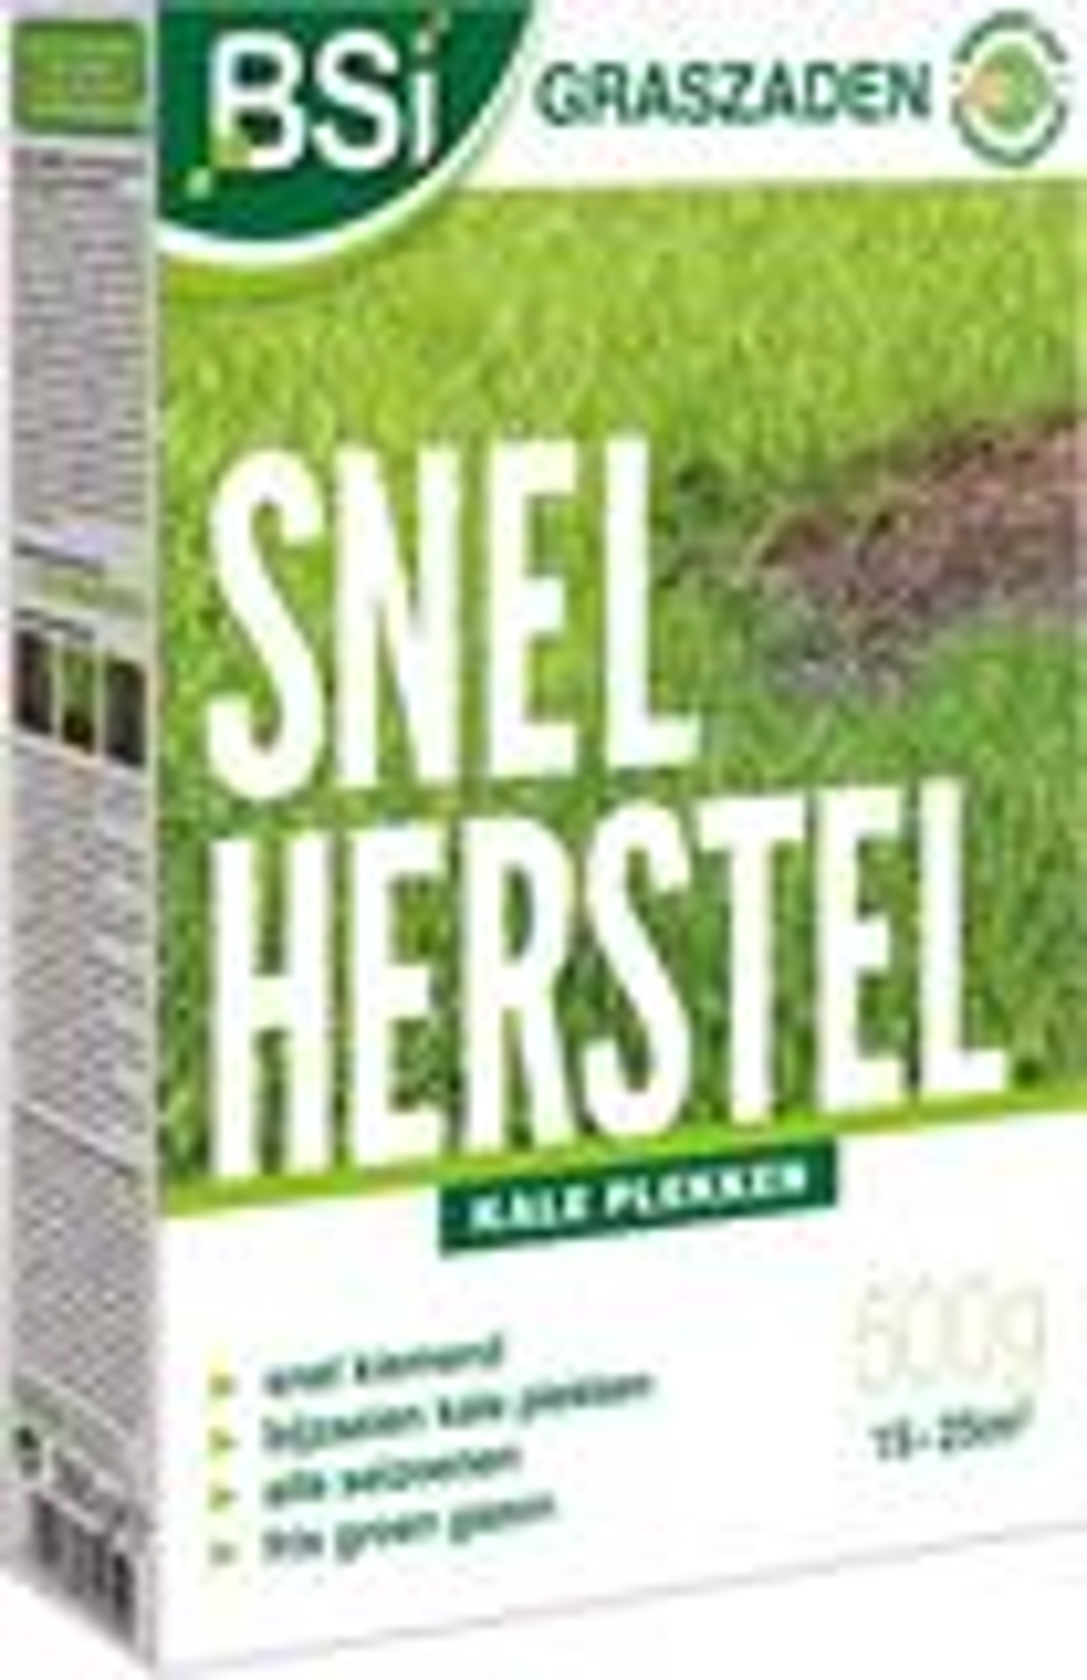 Graszaad BSI Herstel 500gr